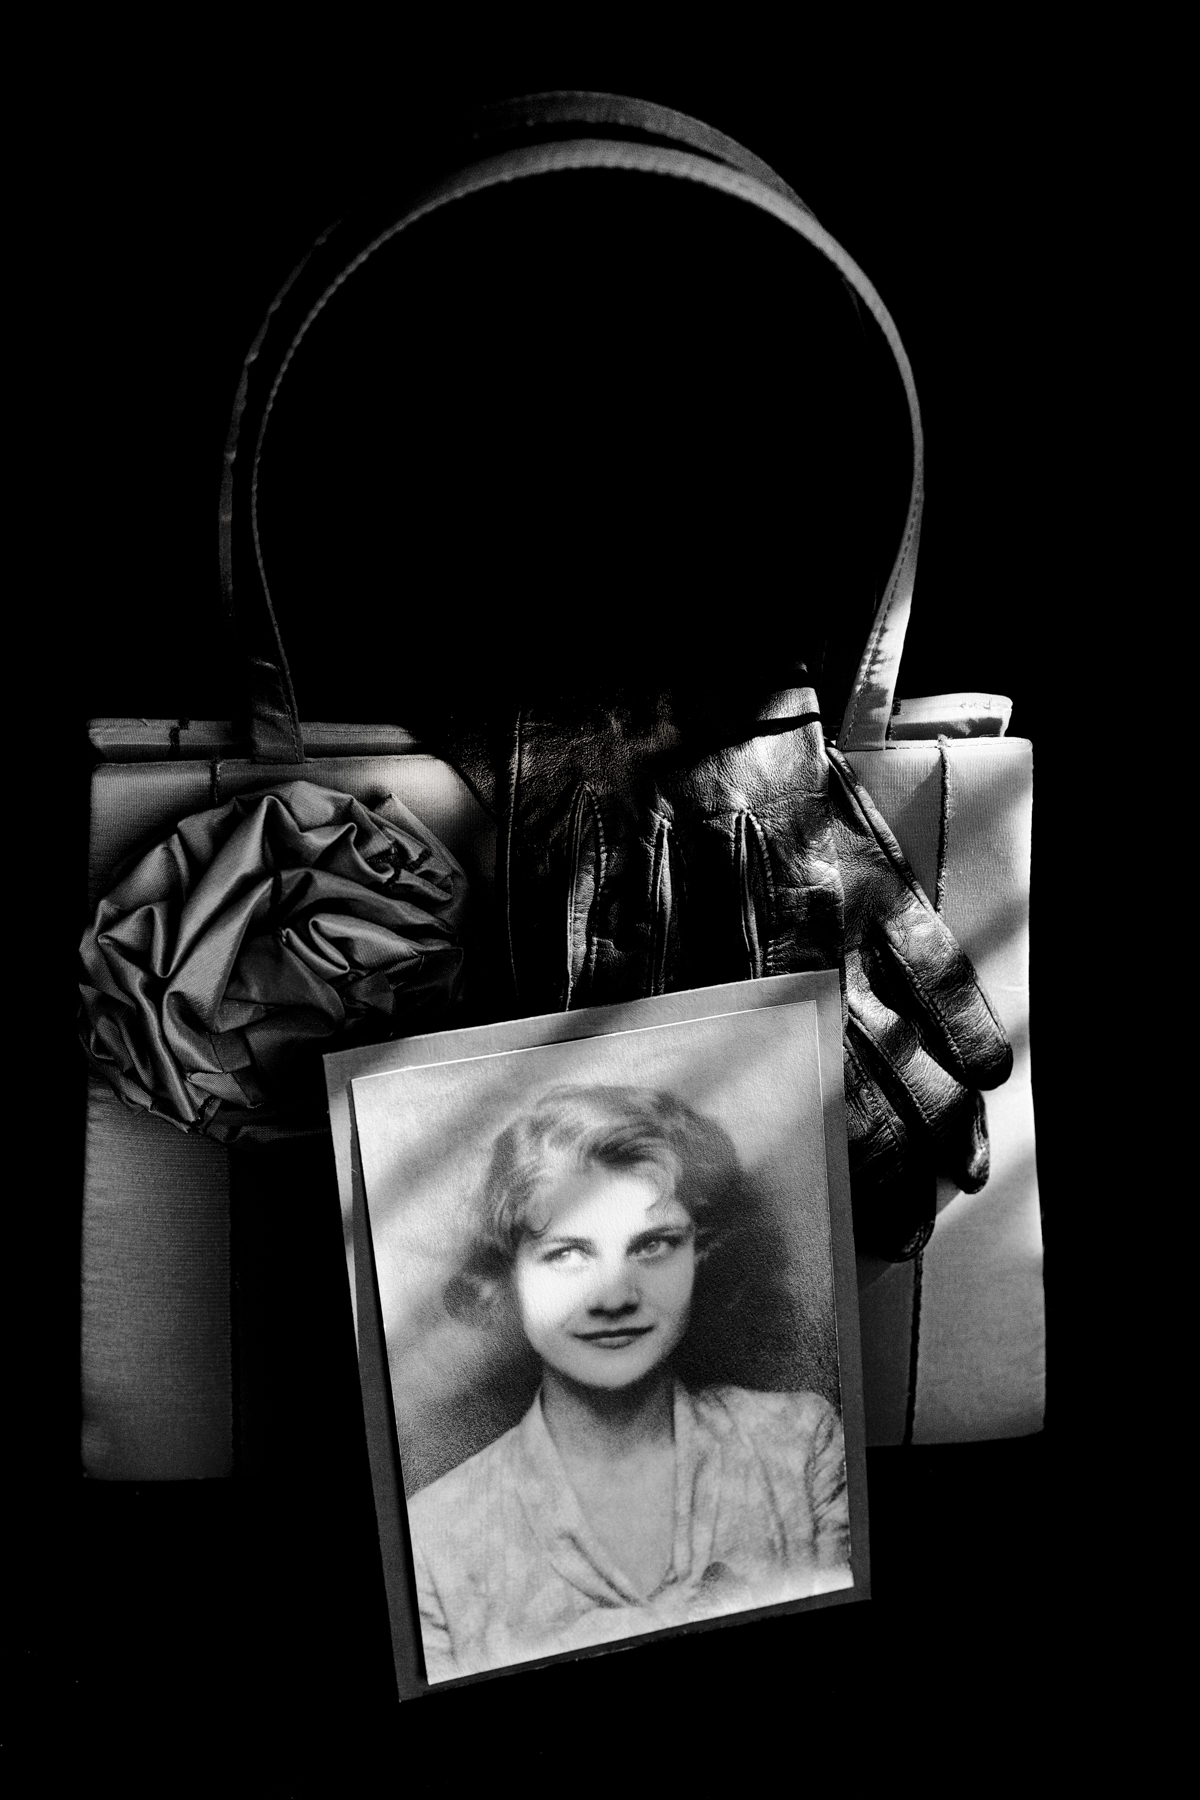 Agnes 1928 by Jacque Rupp